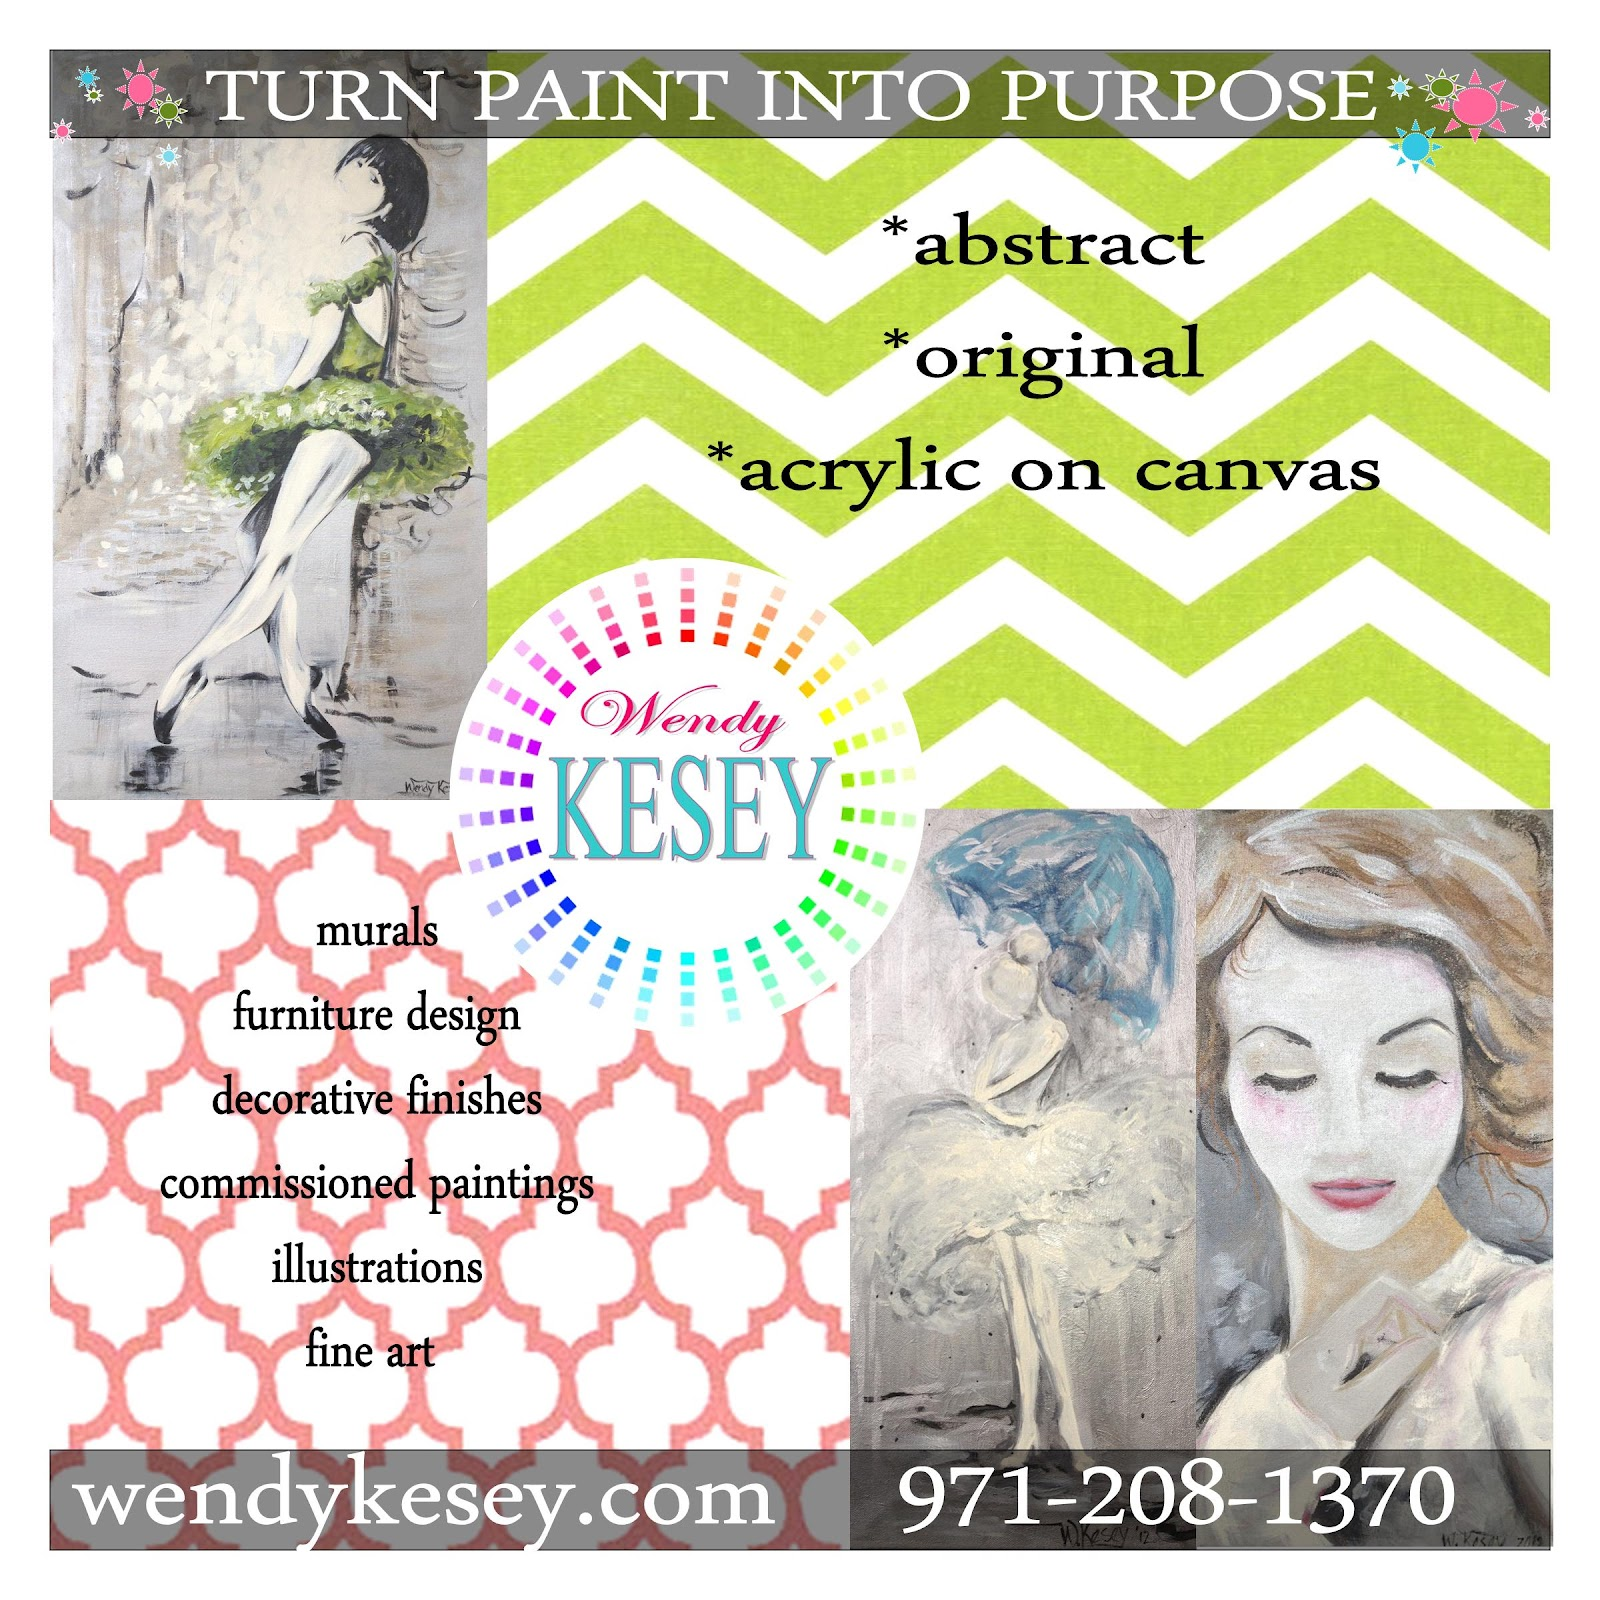 http://1.bp.blogspot.com/-0MFhbdYdpag/T4UCalx8B3I/AAAAAAAAAQM/e-ANgNhBqtQ/s1600/living+social+pic+paintings+ad+2.jpg